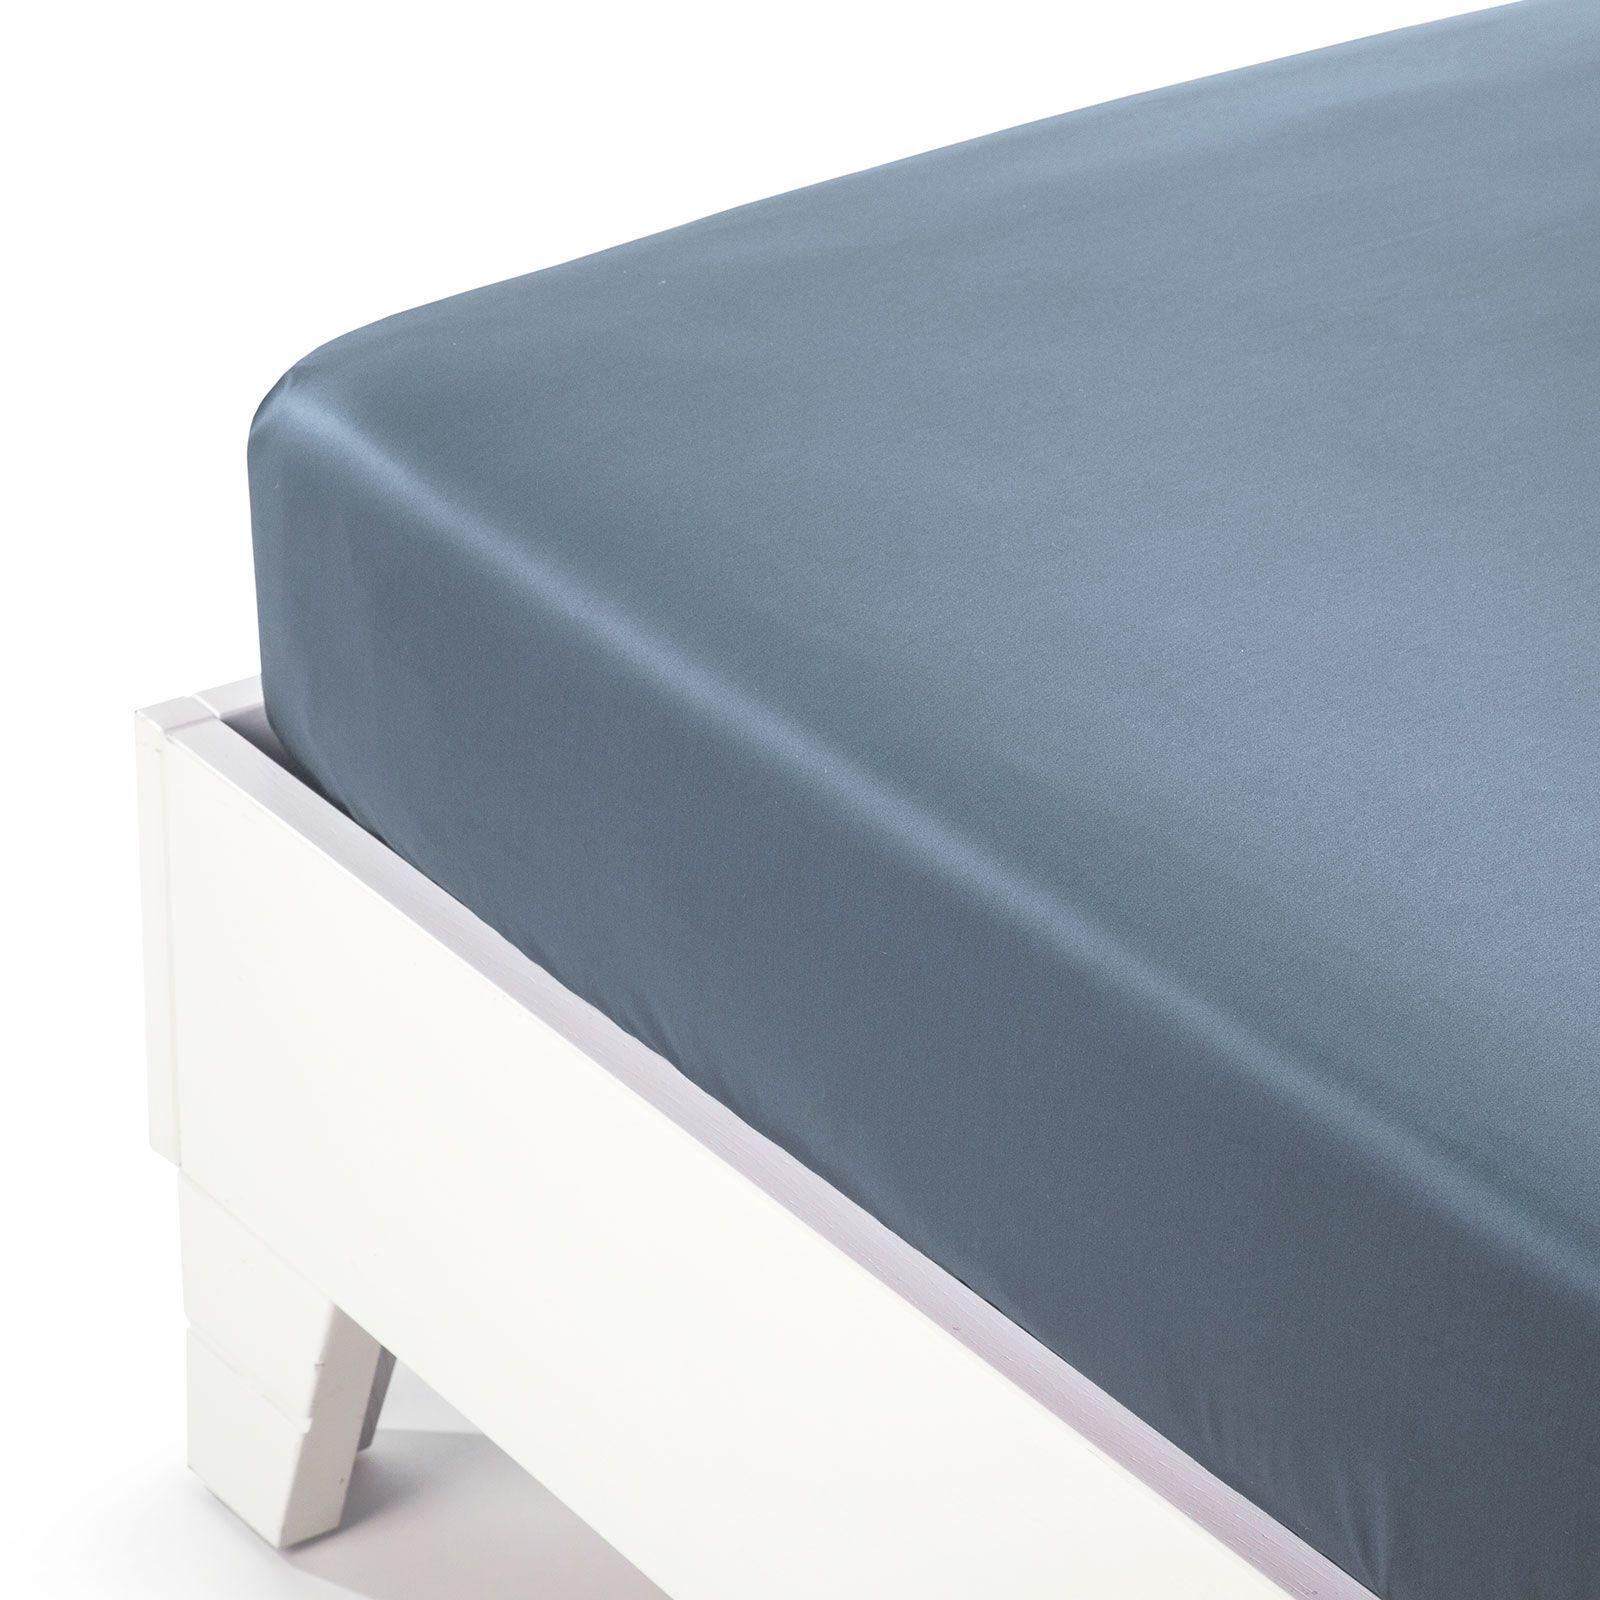 Простыни на резинке Простыня на резинке 220x200 Сaleffi Raso Tinta Unito с бордюром сатин синяя prostynya-na-rezinke-caleffi-raso-tinta-unito-satin-avio-italiya.jpg